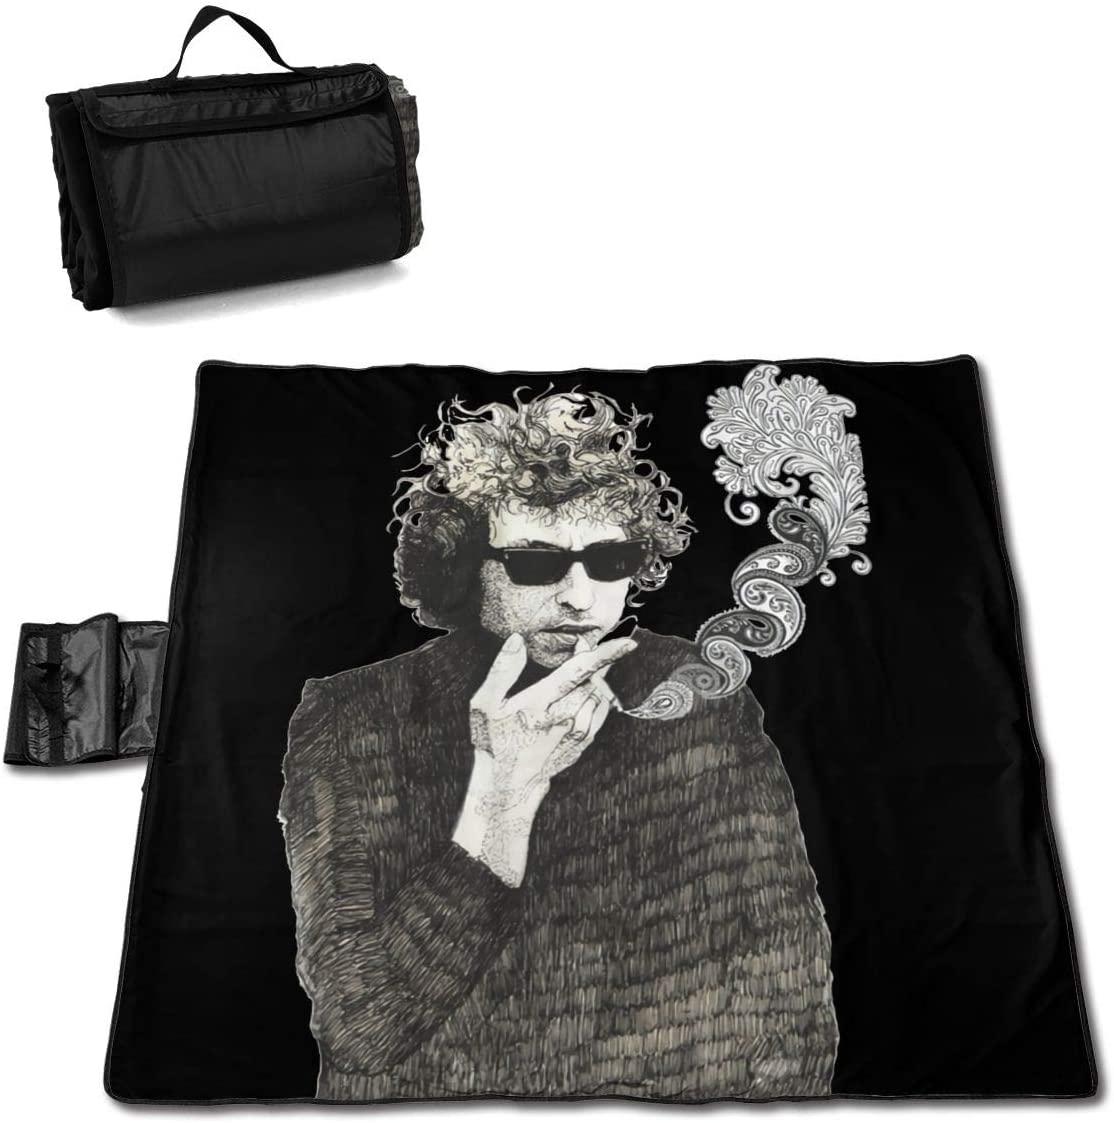 Zcm Bo-B Dylan Funny Portable Printed Picnic Blanket Waterproof 59x57(in)